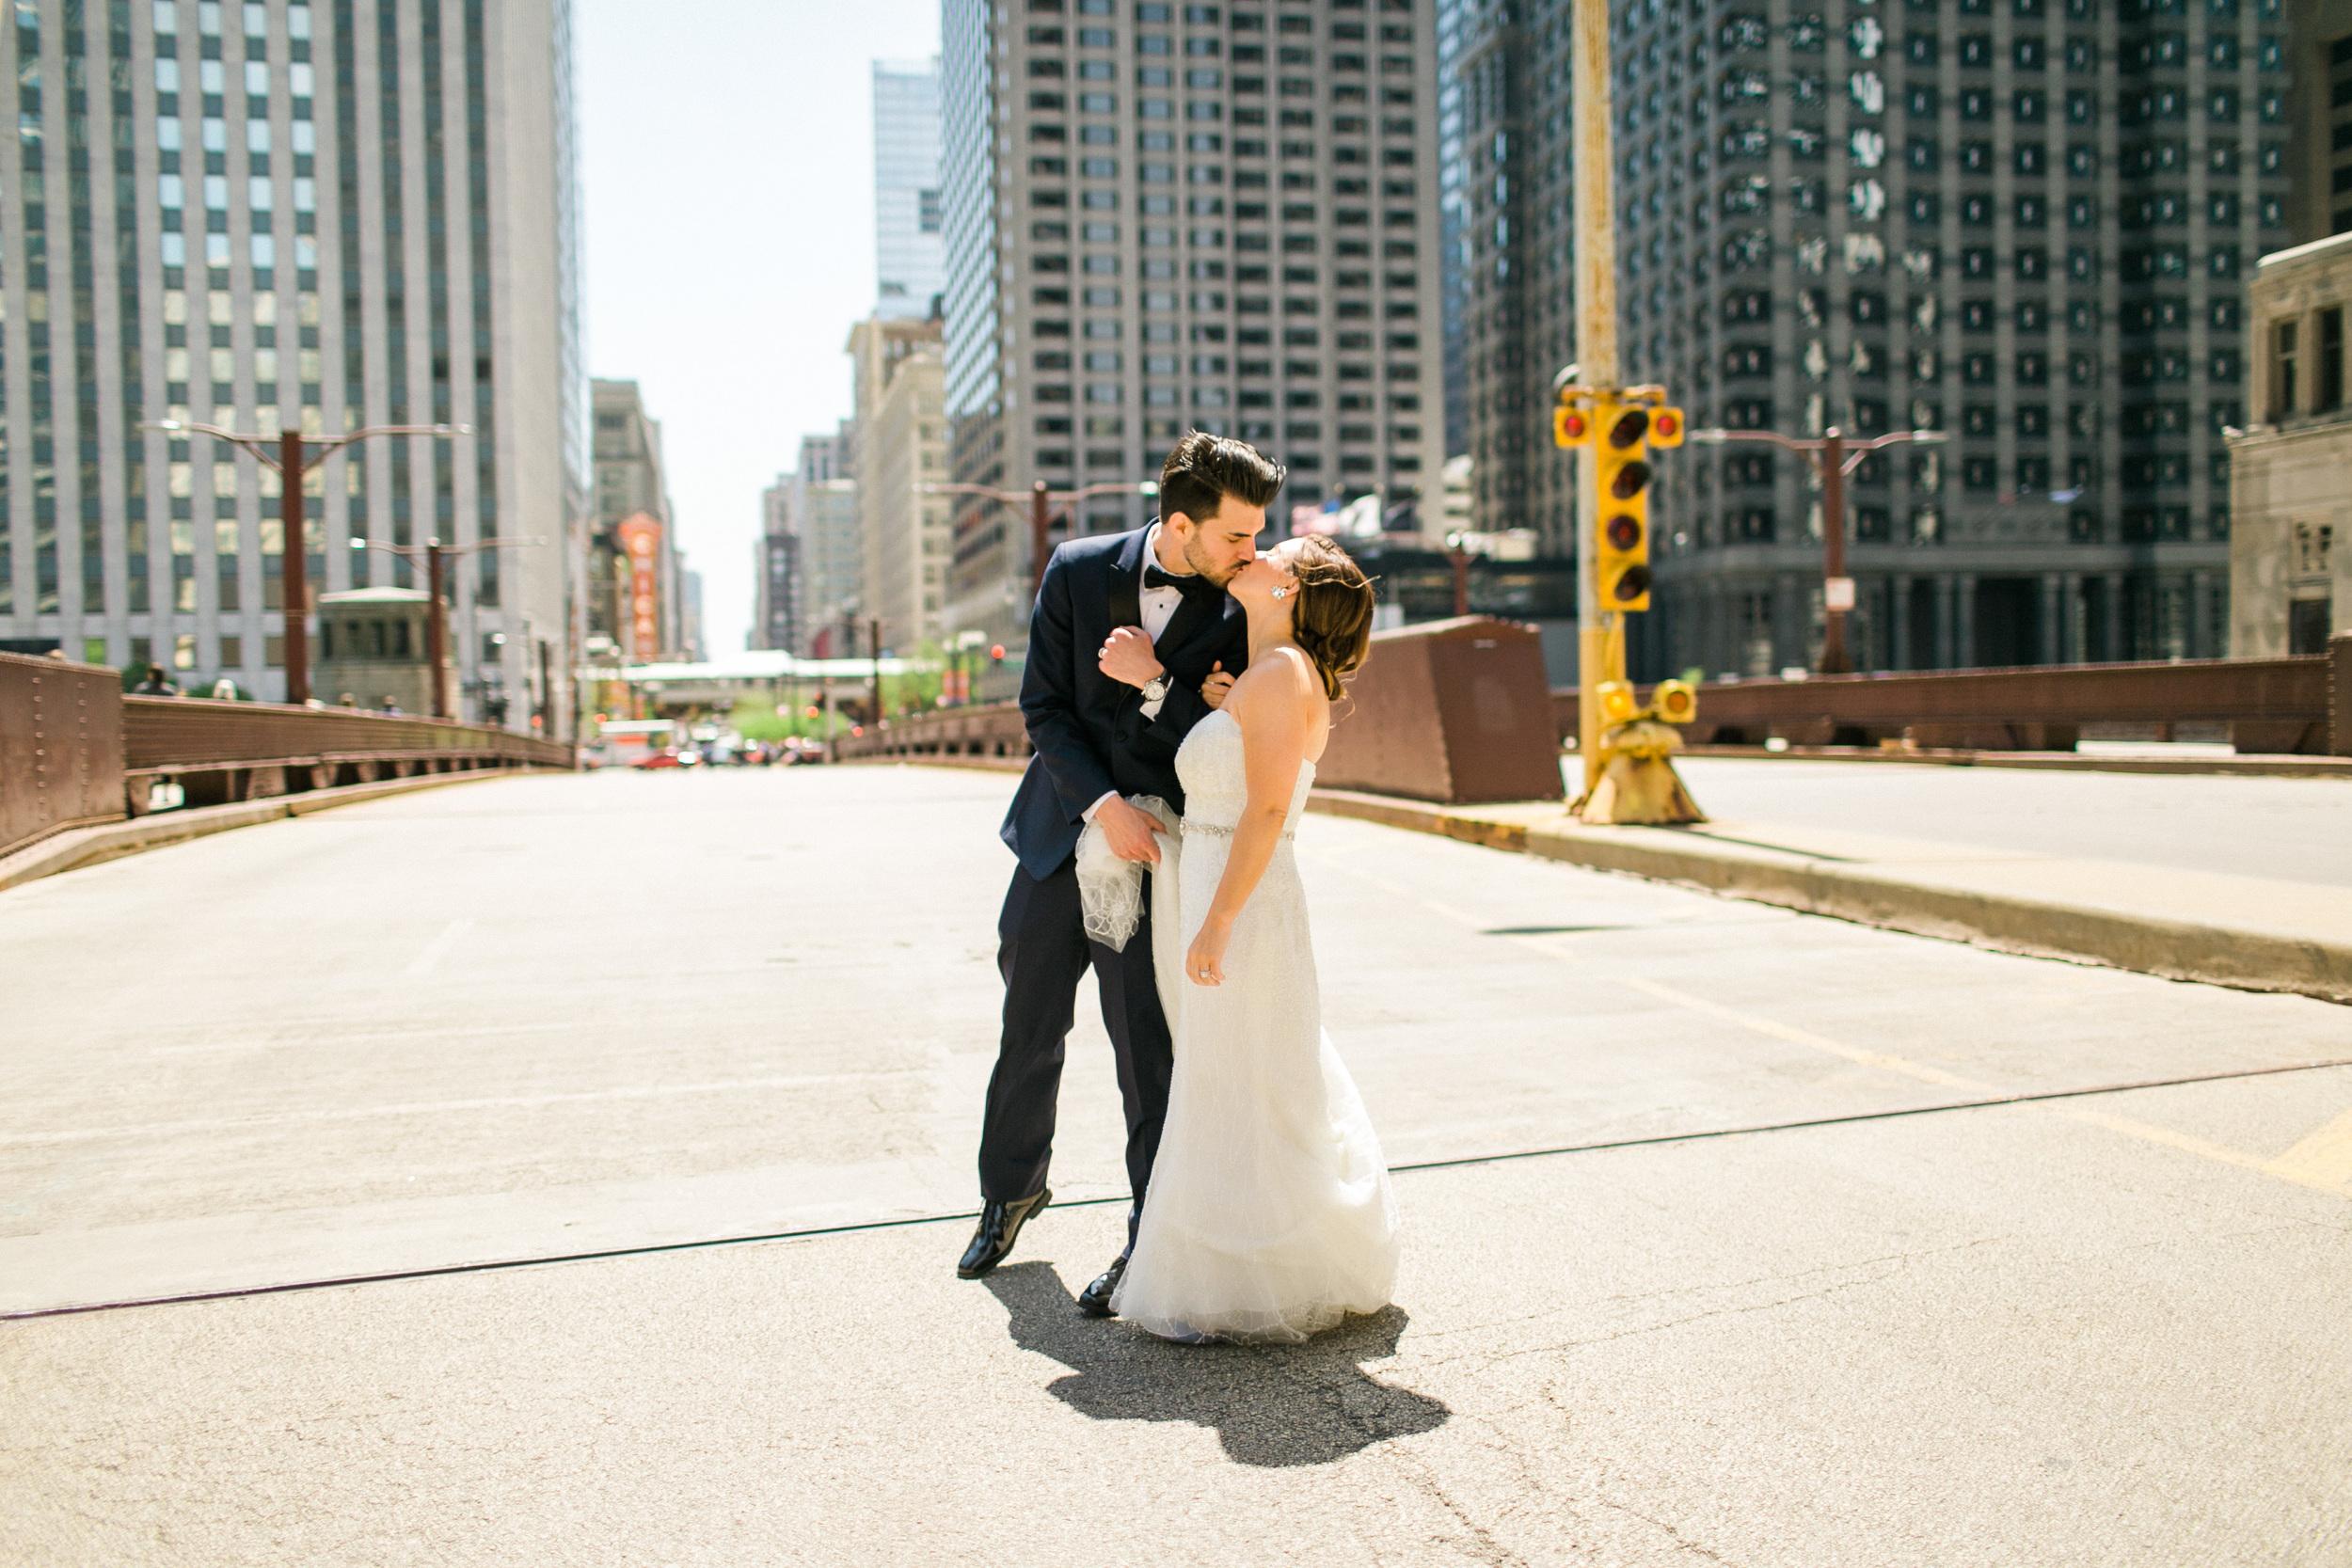 mayden_photography_weddings-40.jpg